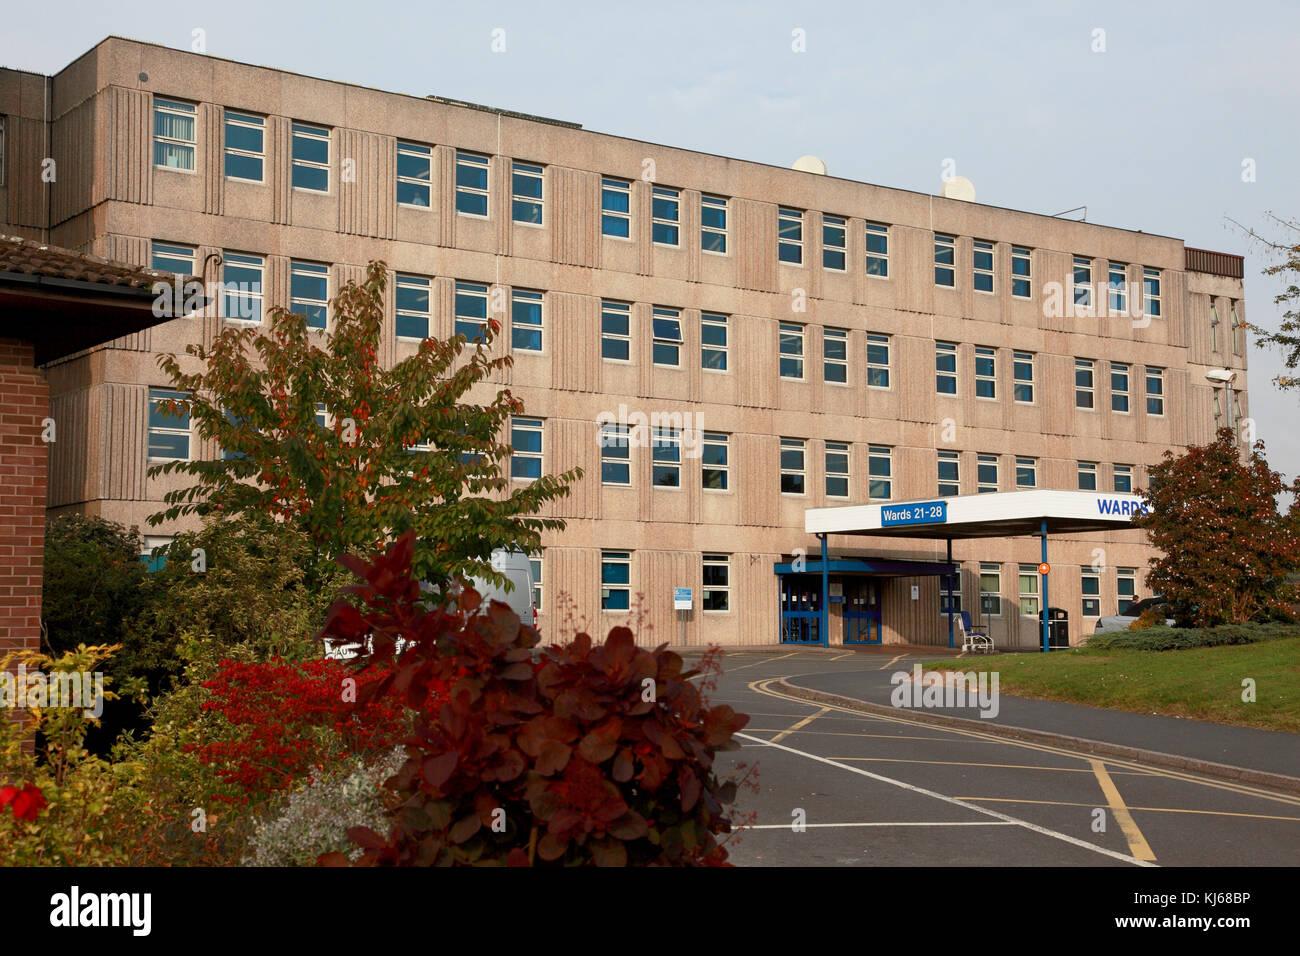 Entrance to the main wards of the NHS Royal Shrewsbury Hospital, a teaching hospital - Stock Image